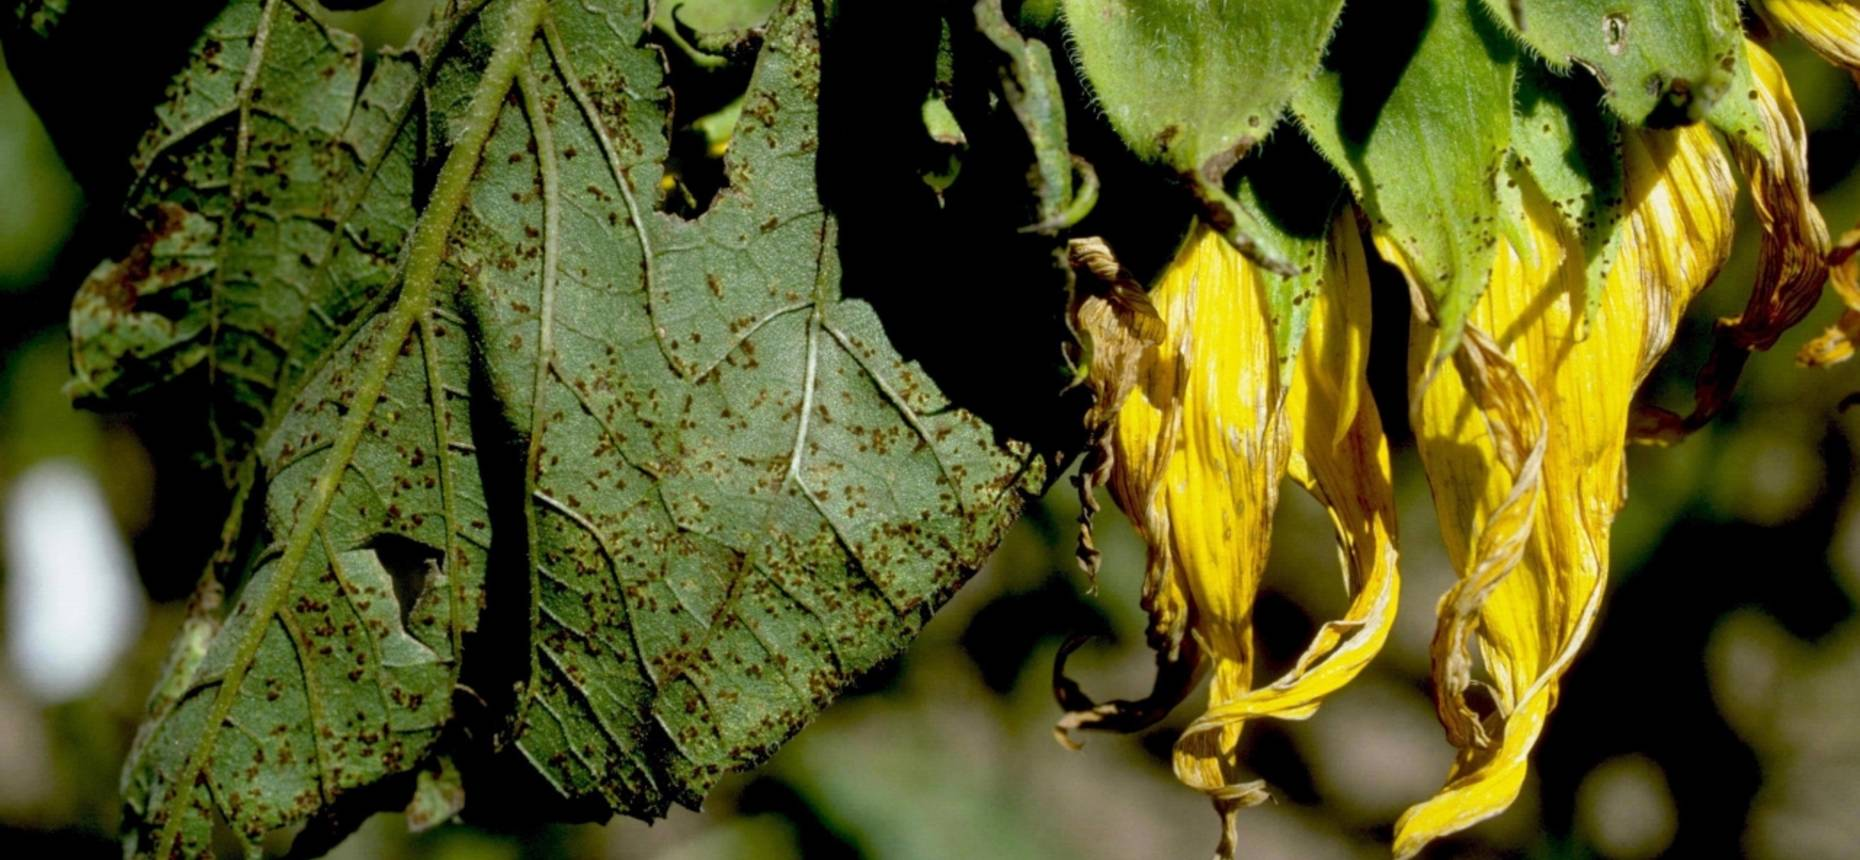 Ржавчина подсолнечника - Puccinia helianthi Schwein